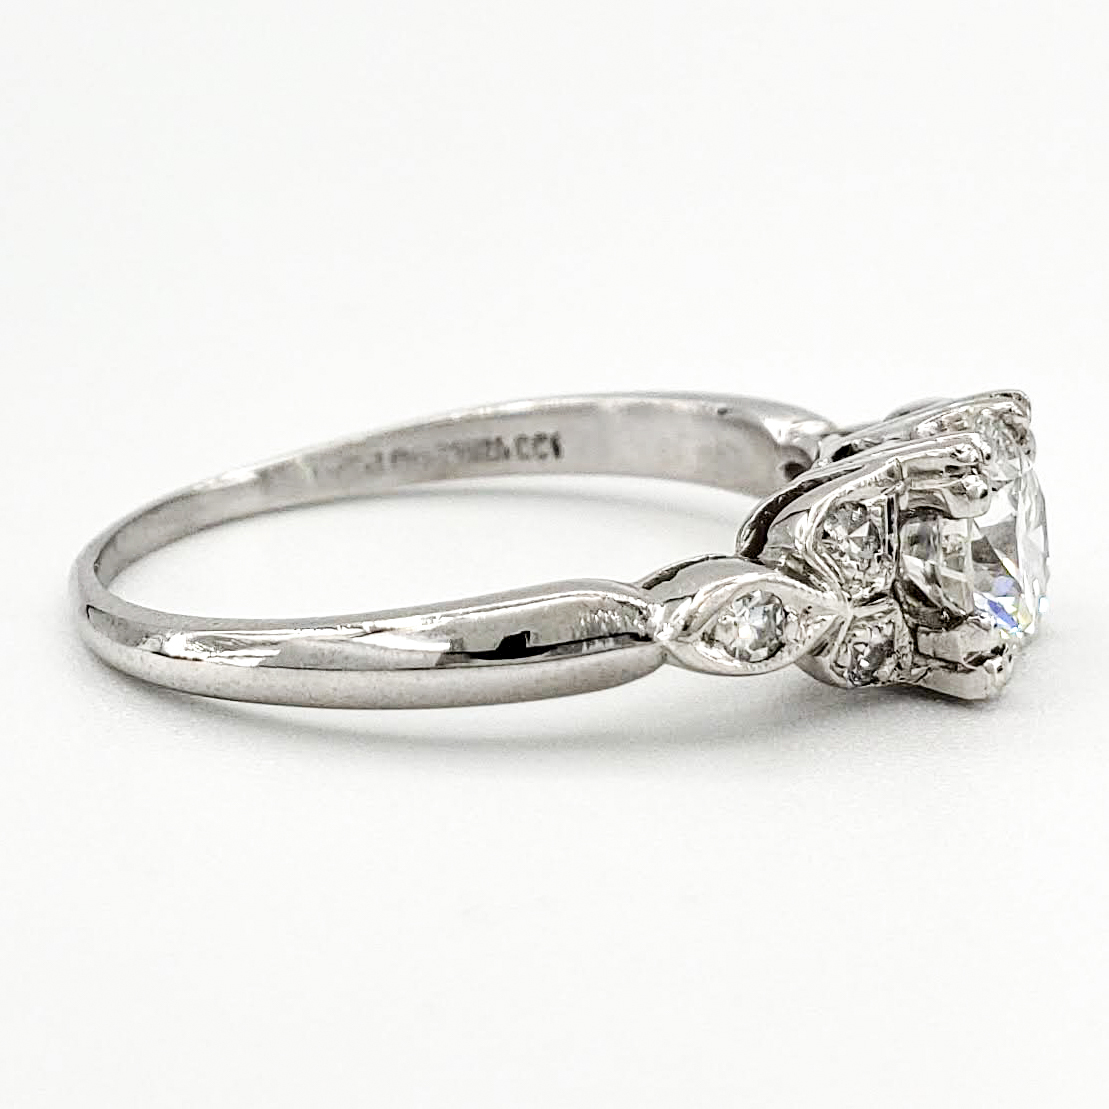 Vintage Platinum Engagement Ring With 0.69 Carat Round Brilliant Cut Diamond EGL – D VS1